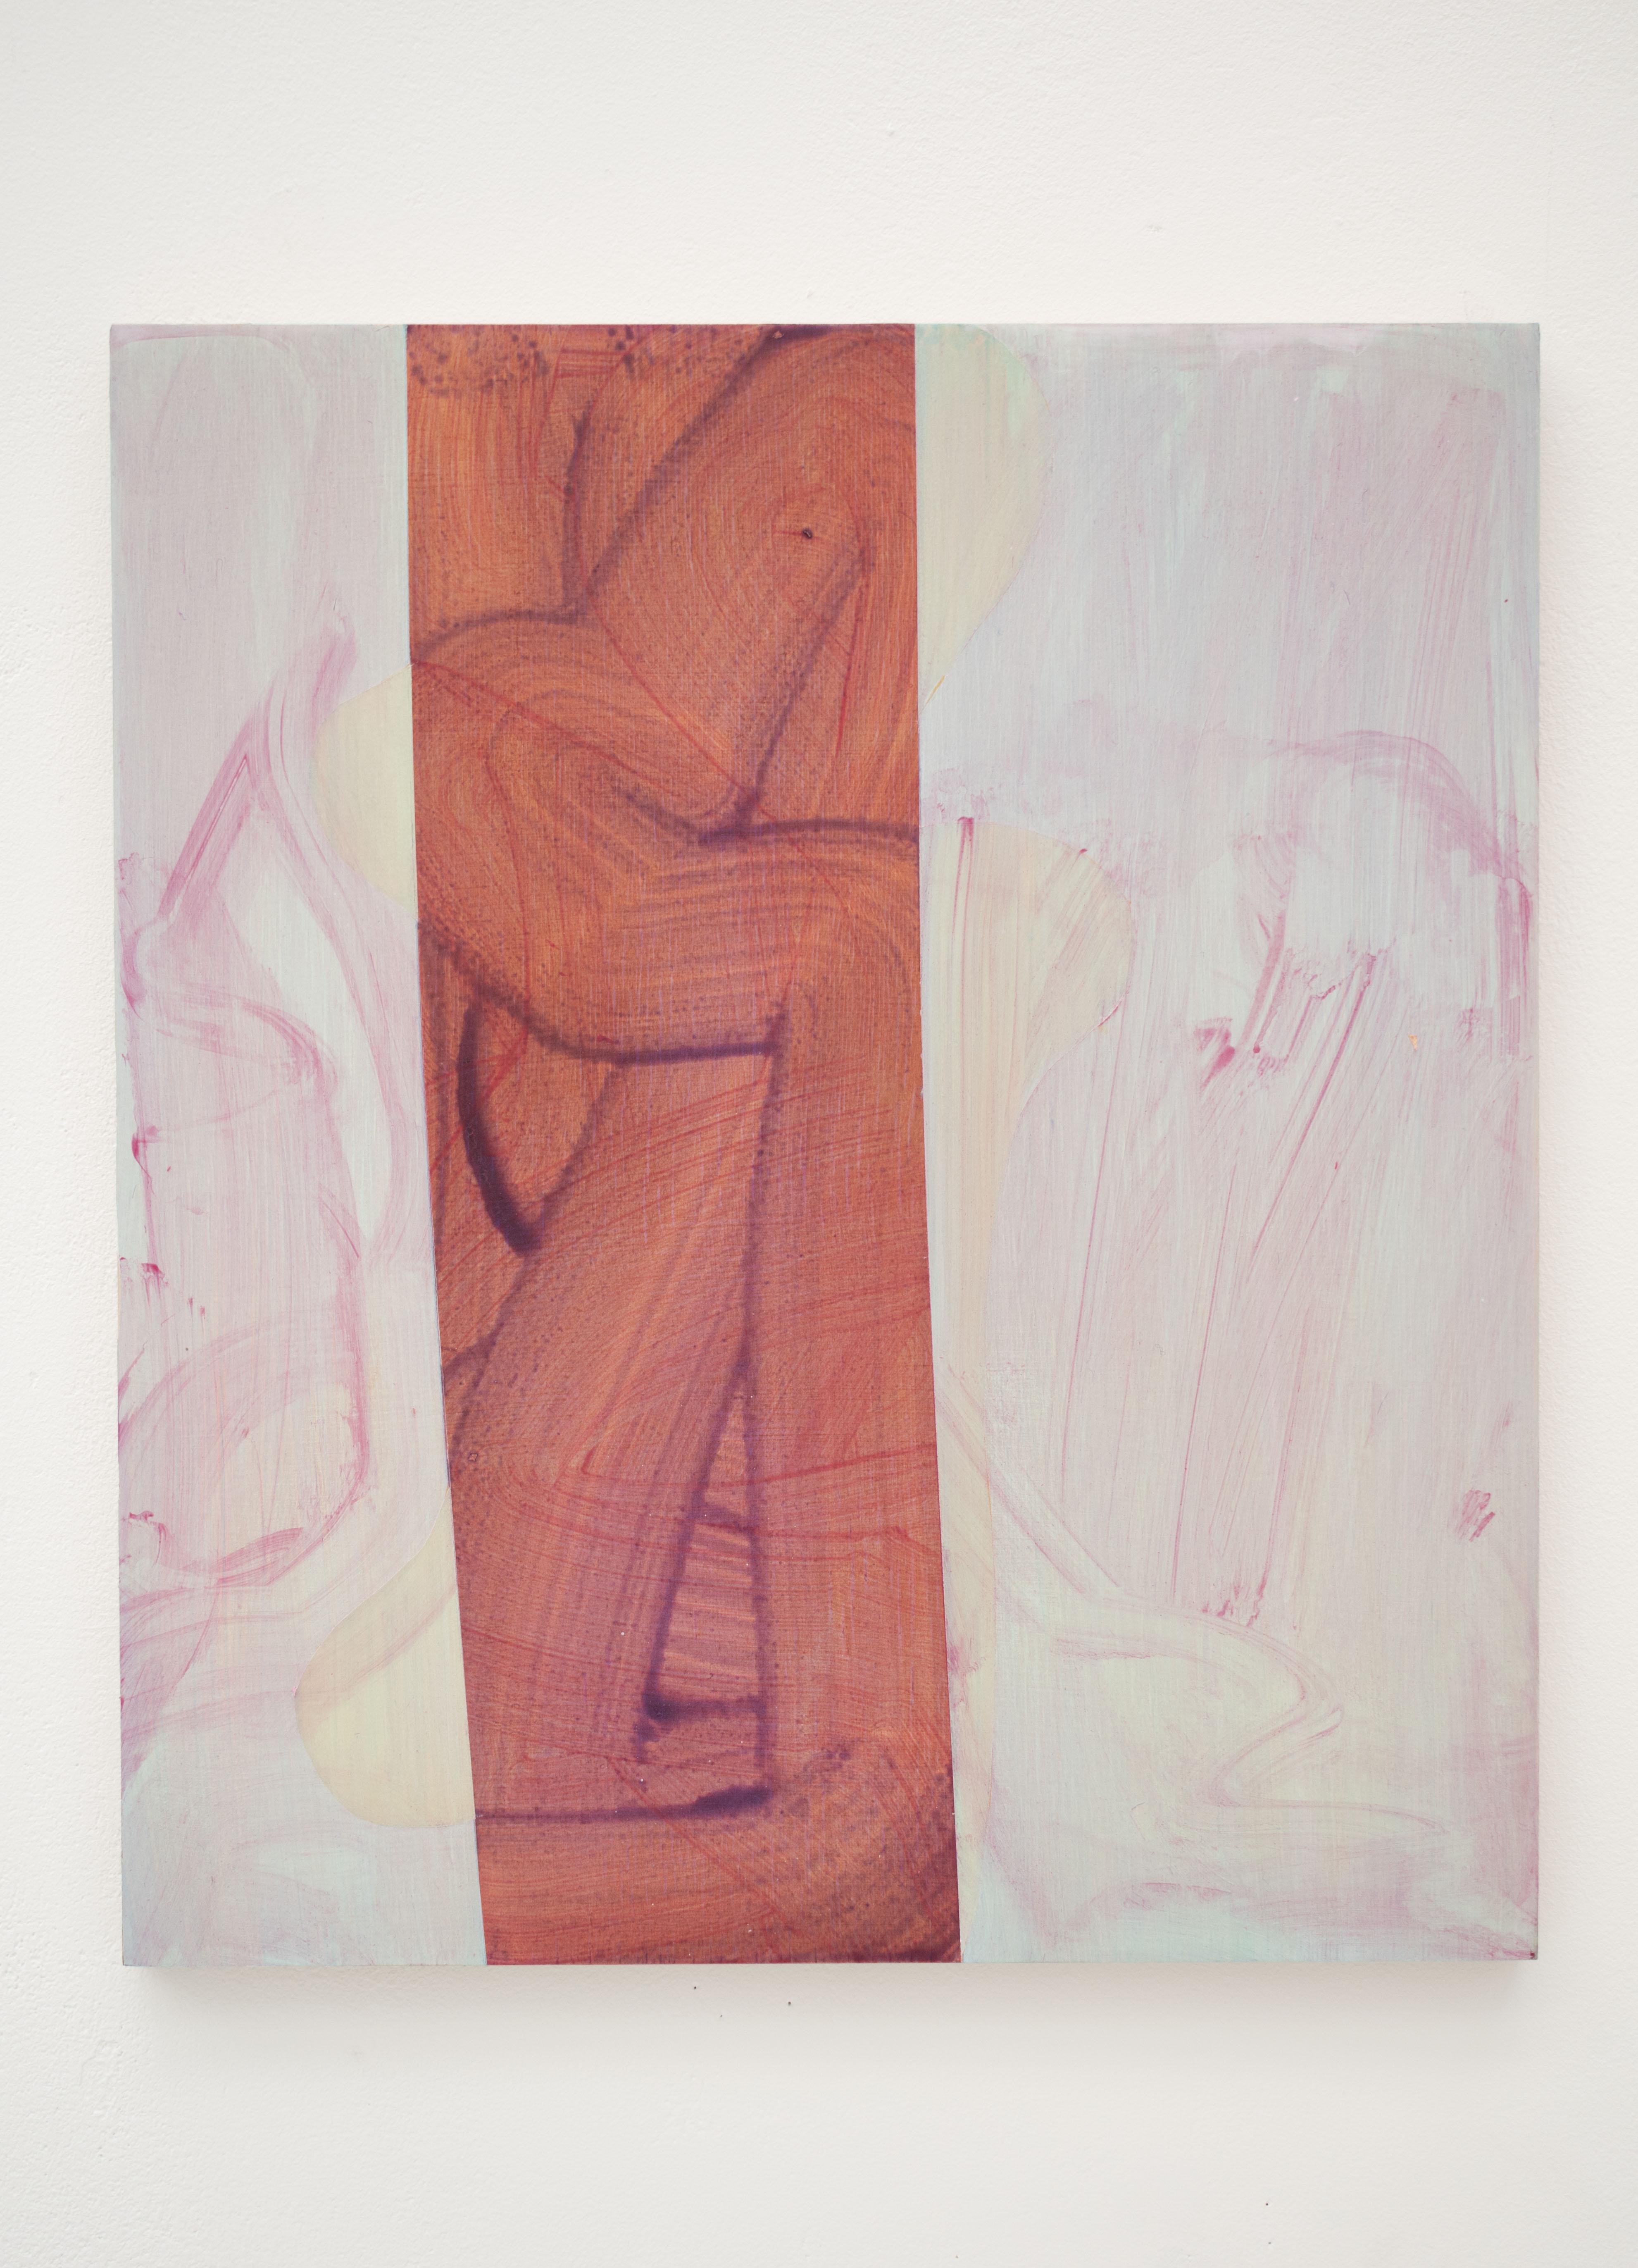 Anamorphic 3, 2021, Acrylic on Birch Ply, 40cm x 45cm